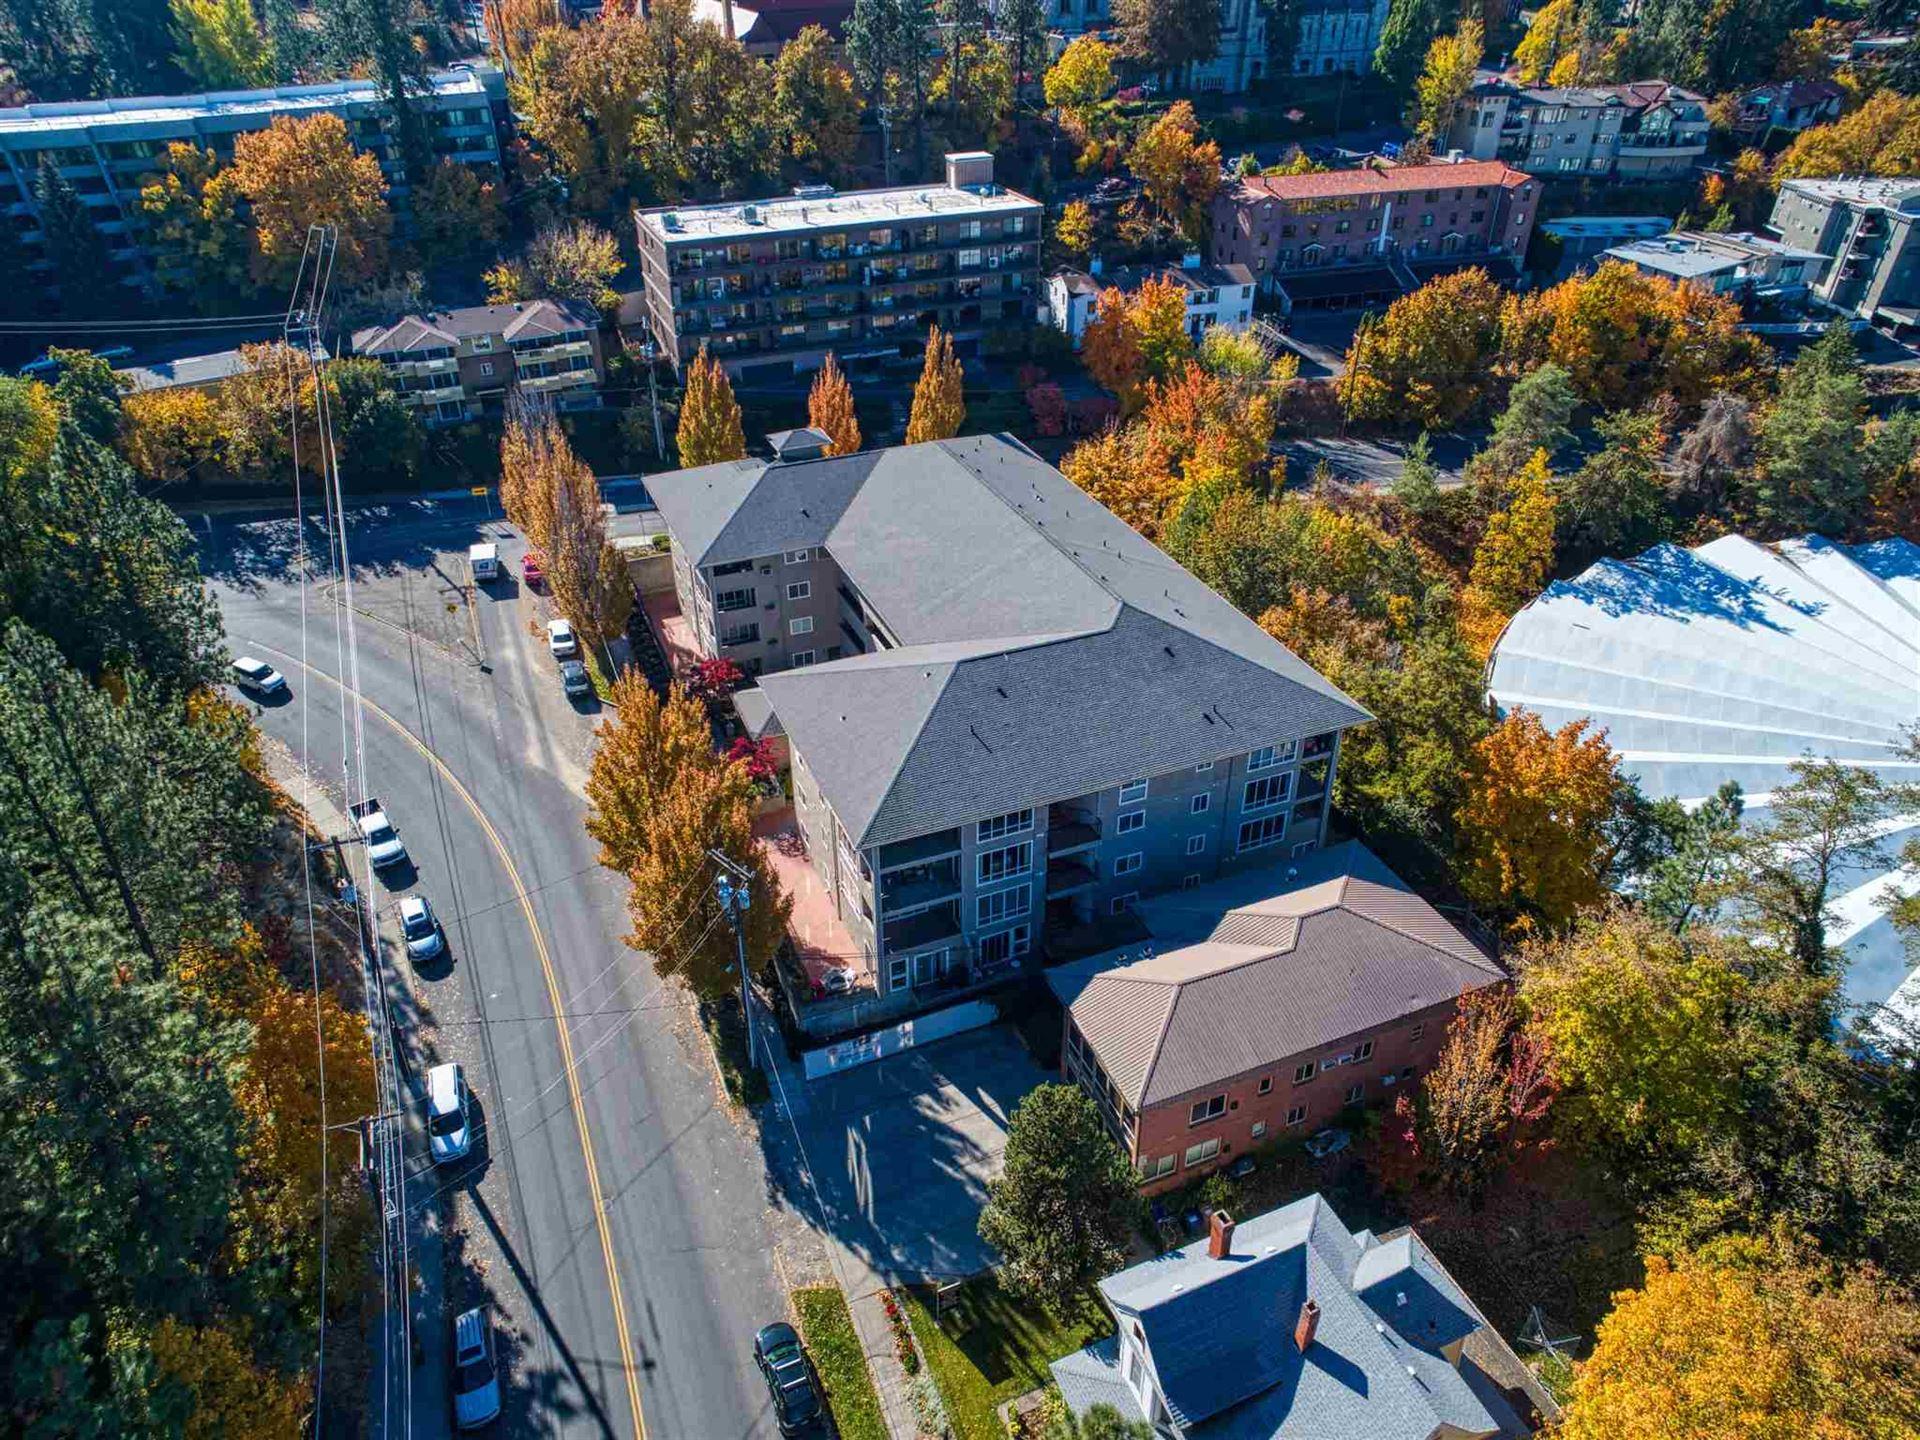 Photo of 930 S Cowley St #207, Spokane, WA 99202 (MLS # 202119485)